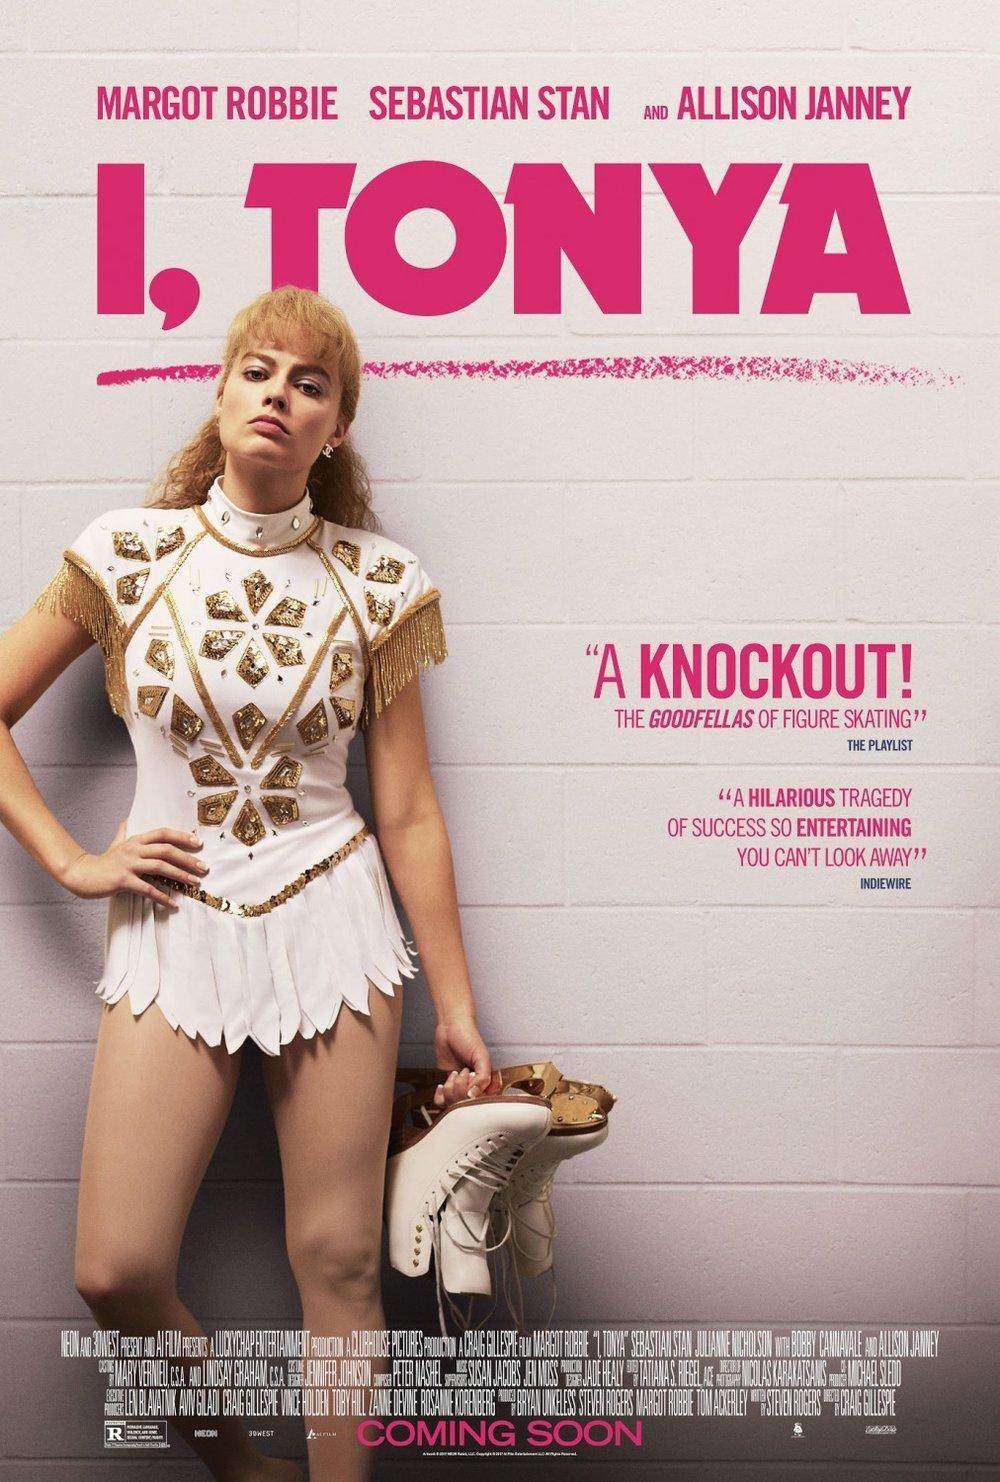 I, Tonya  (2017)  IMDB Link:  https://www.imdb.com/title/tt5580036/